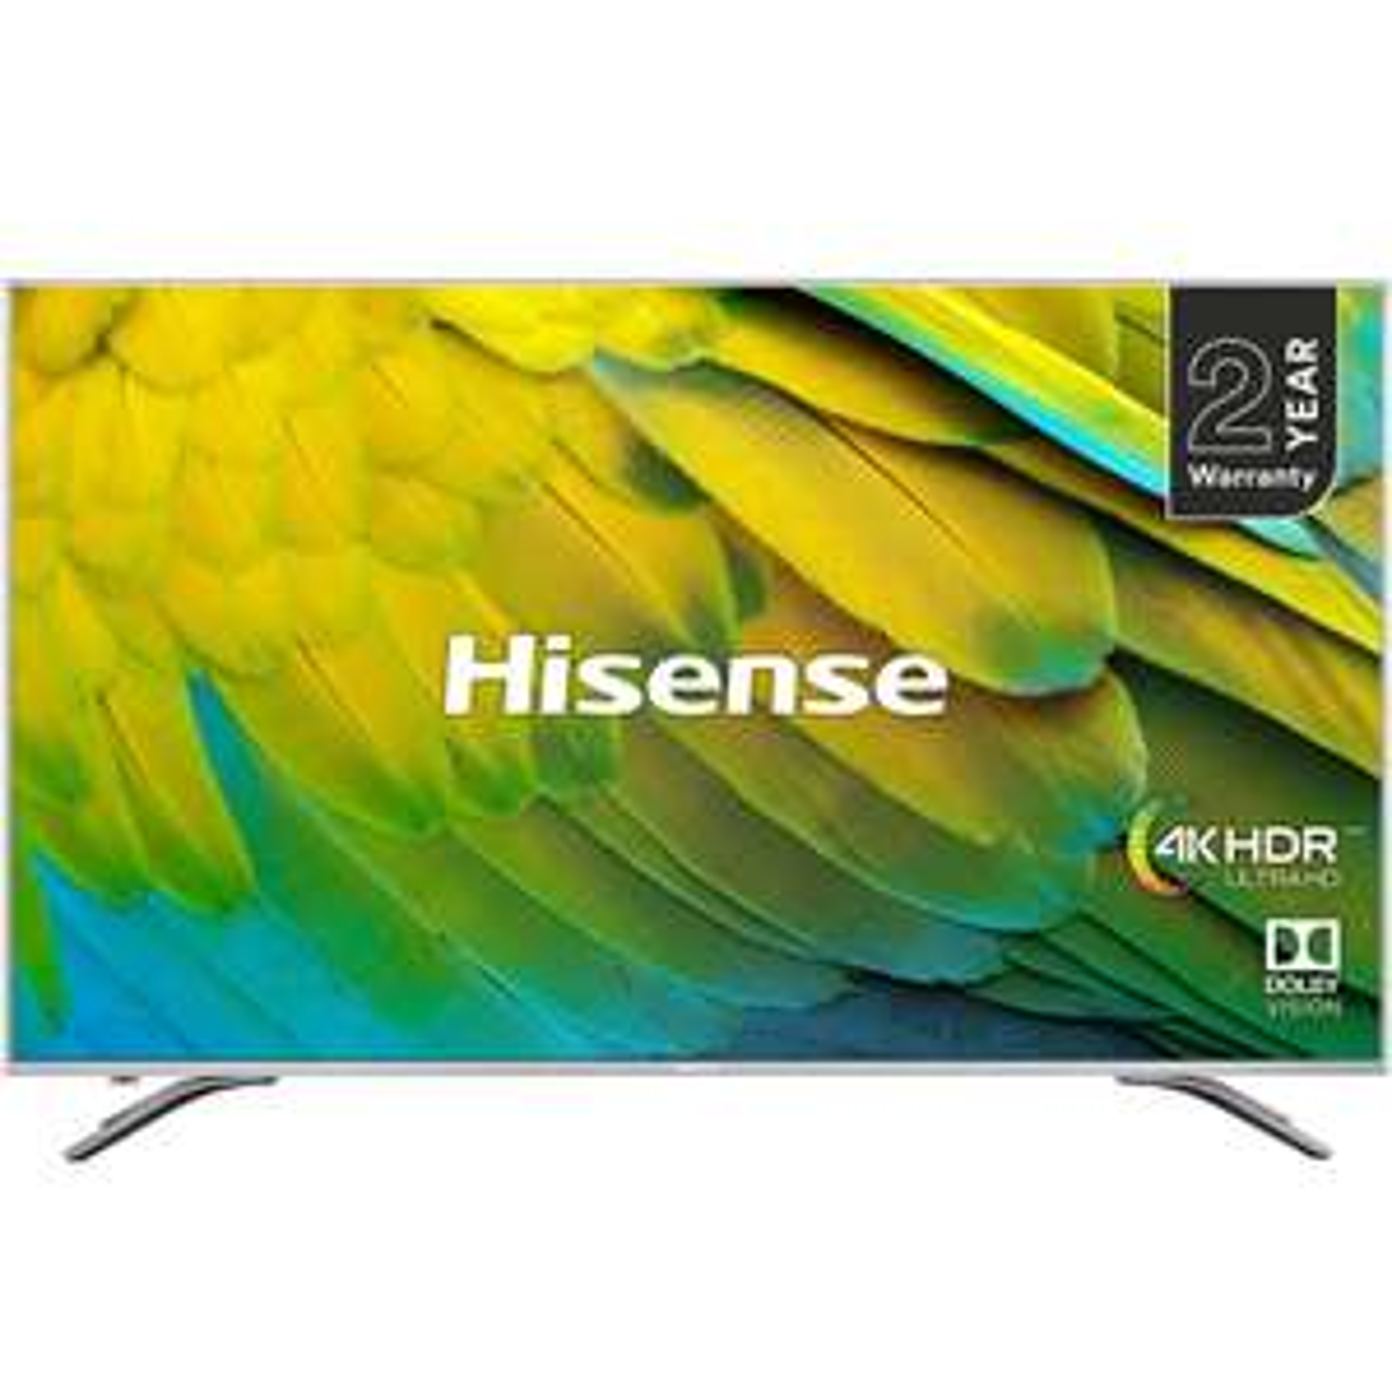 "TV 75"" Hisense H75B7510 - LED, 4K UHD, HDR 10+, Dolby Vision, Smart TV (Via ODR de 50€)"